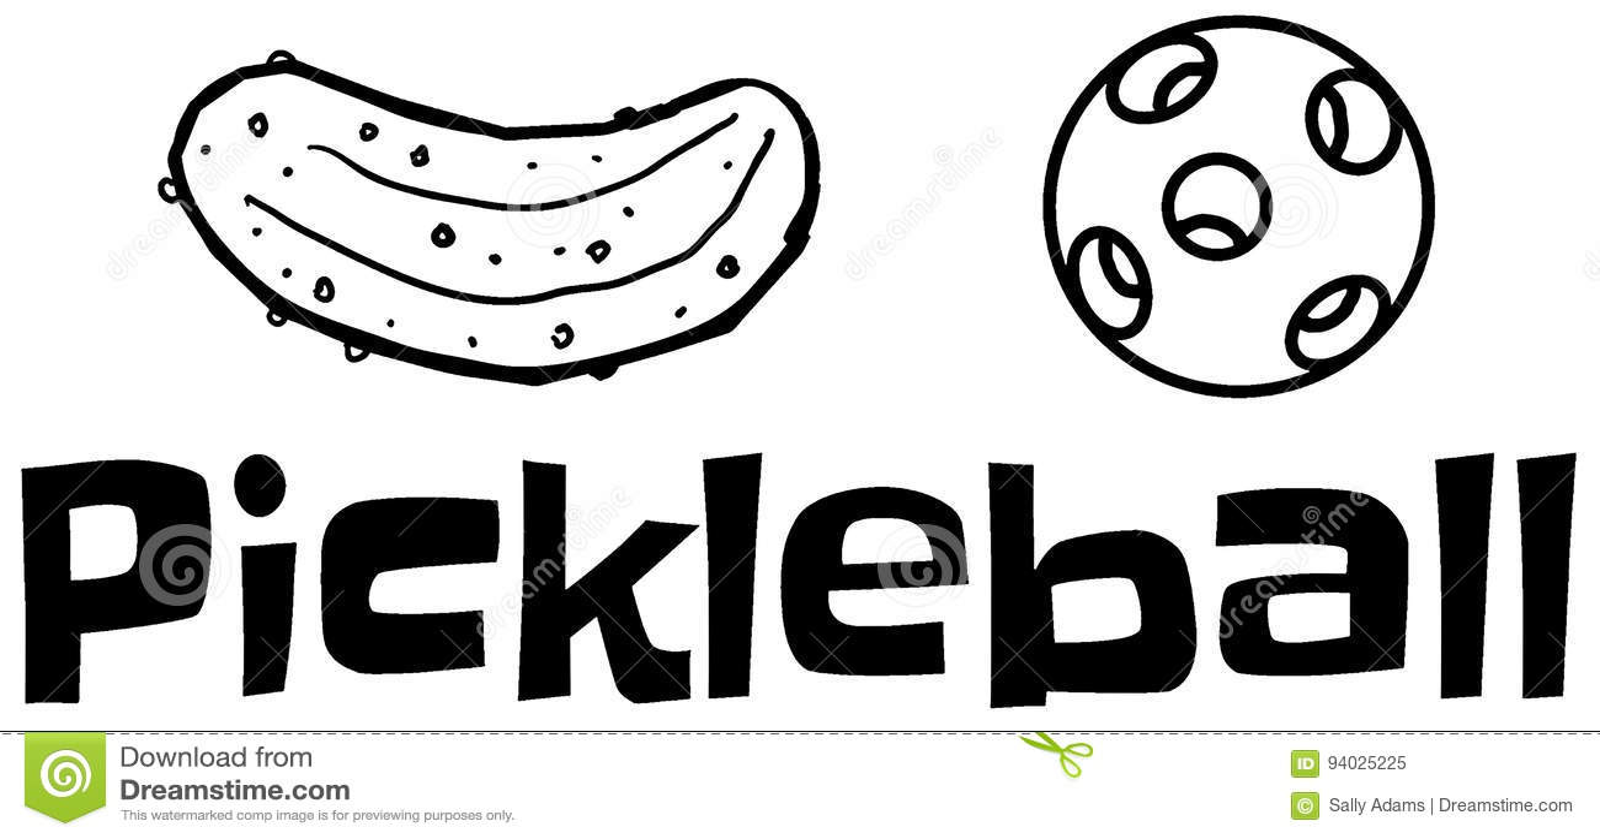 Pickle + Ball stock illustration. Illustration of font